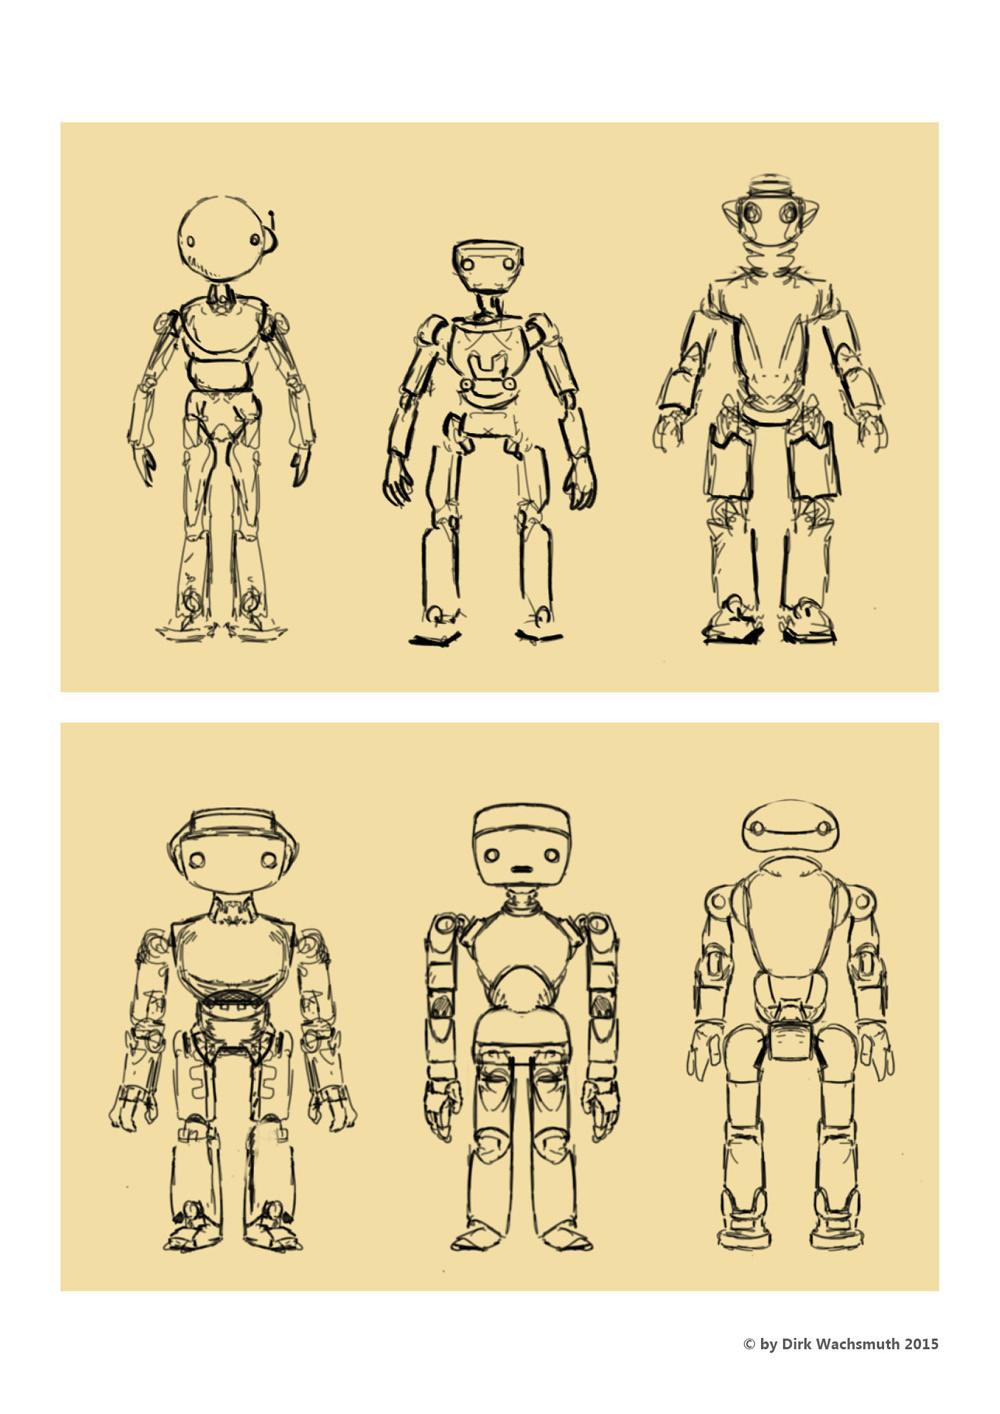 Dirk wachsmuth robot concepts alphama9